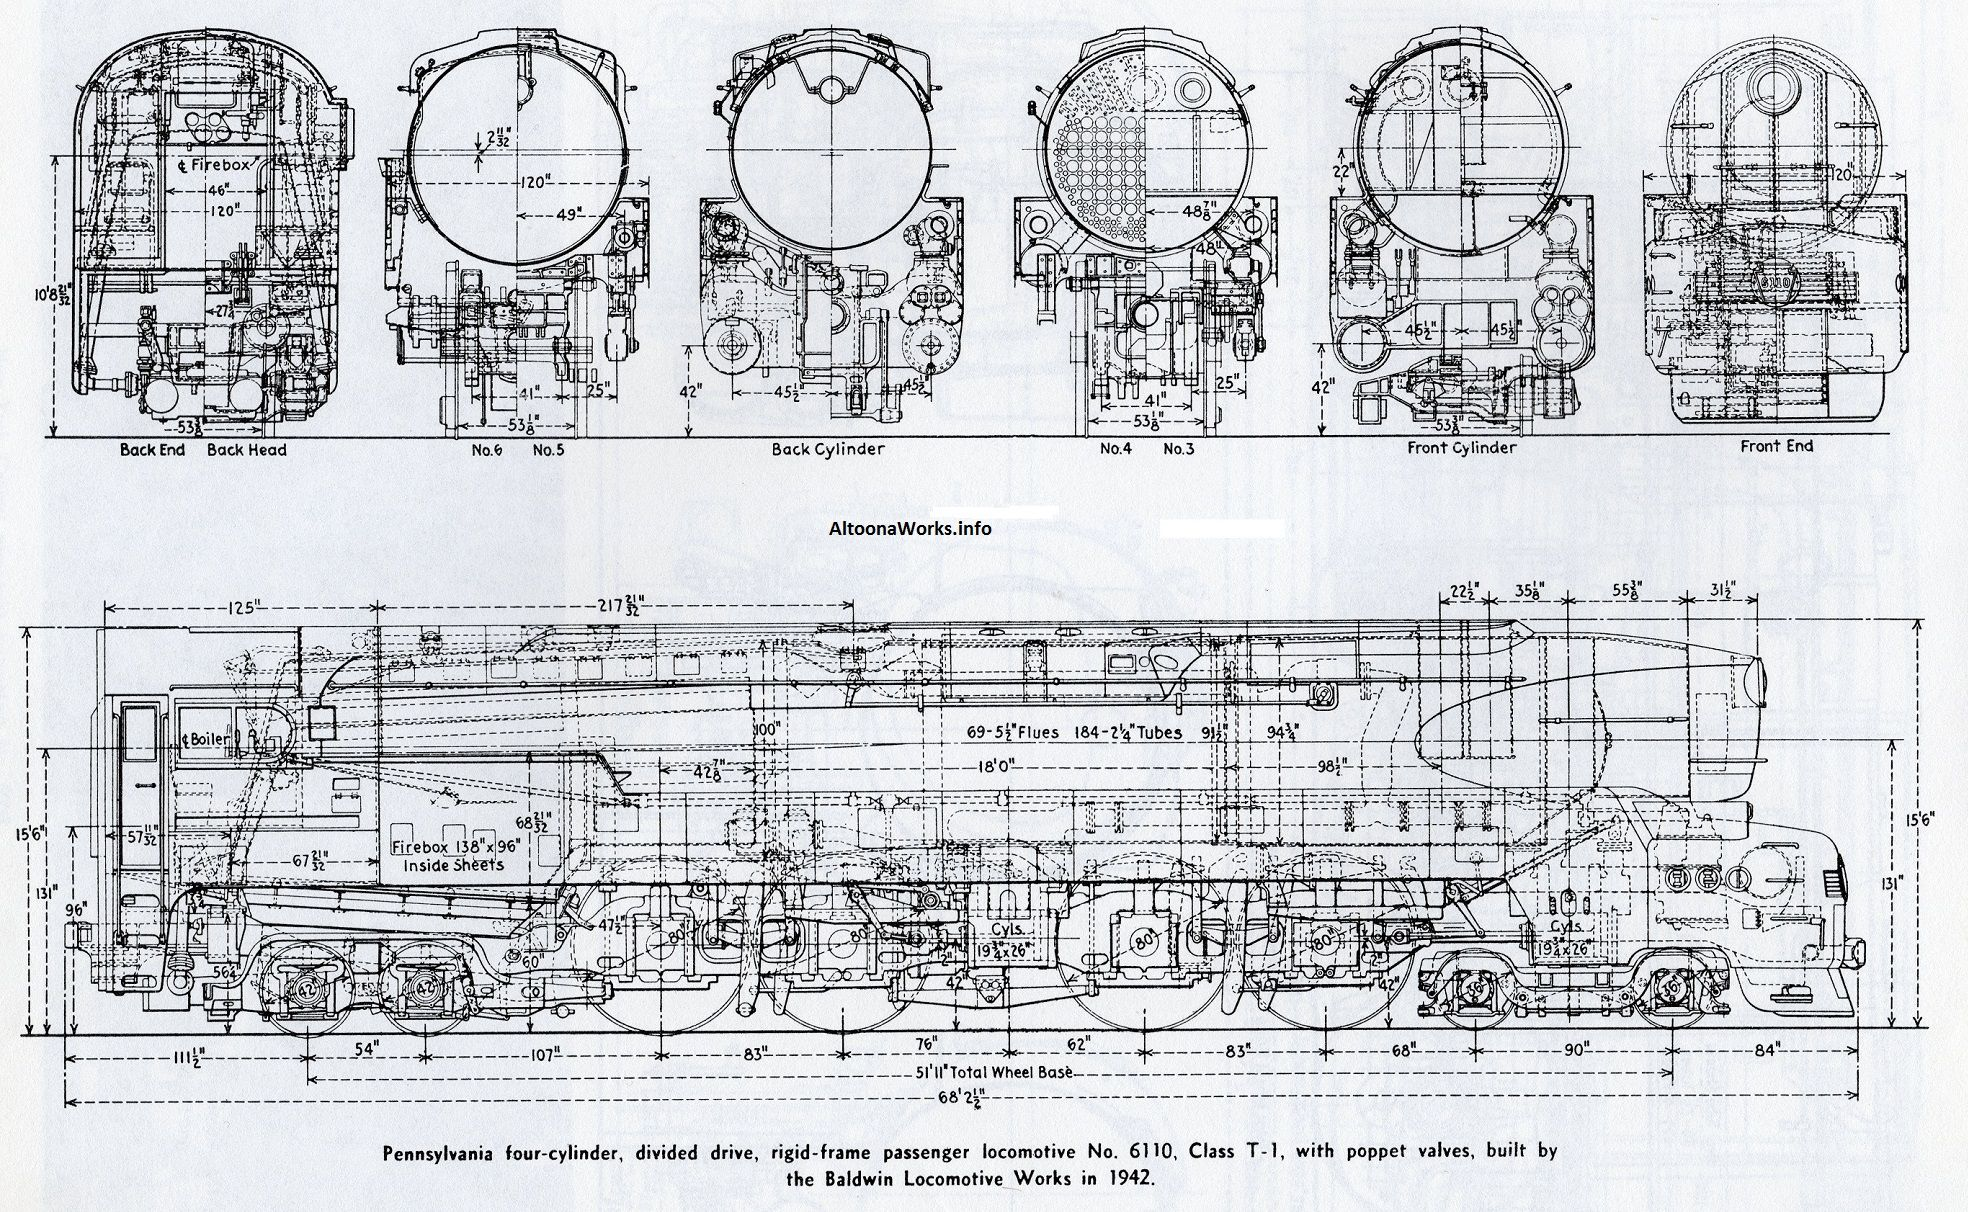 pennsylvania t 1 4 4 4 4 baldwin 1942 locomotive cutaways prr barge diagram [ 1968 x 1212 Pixel ]